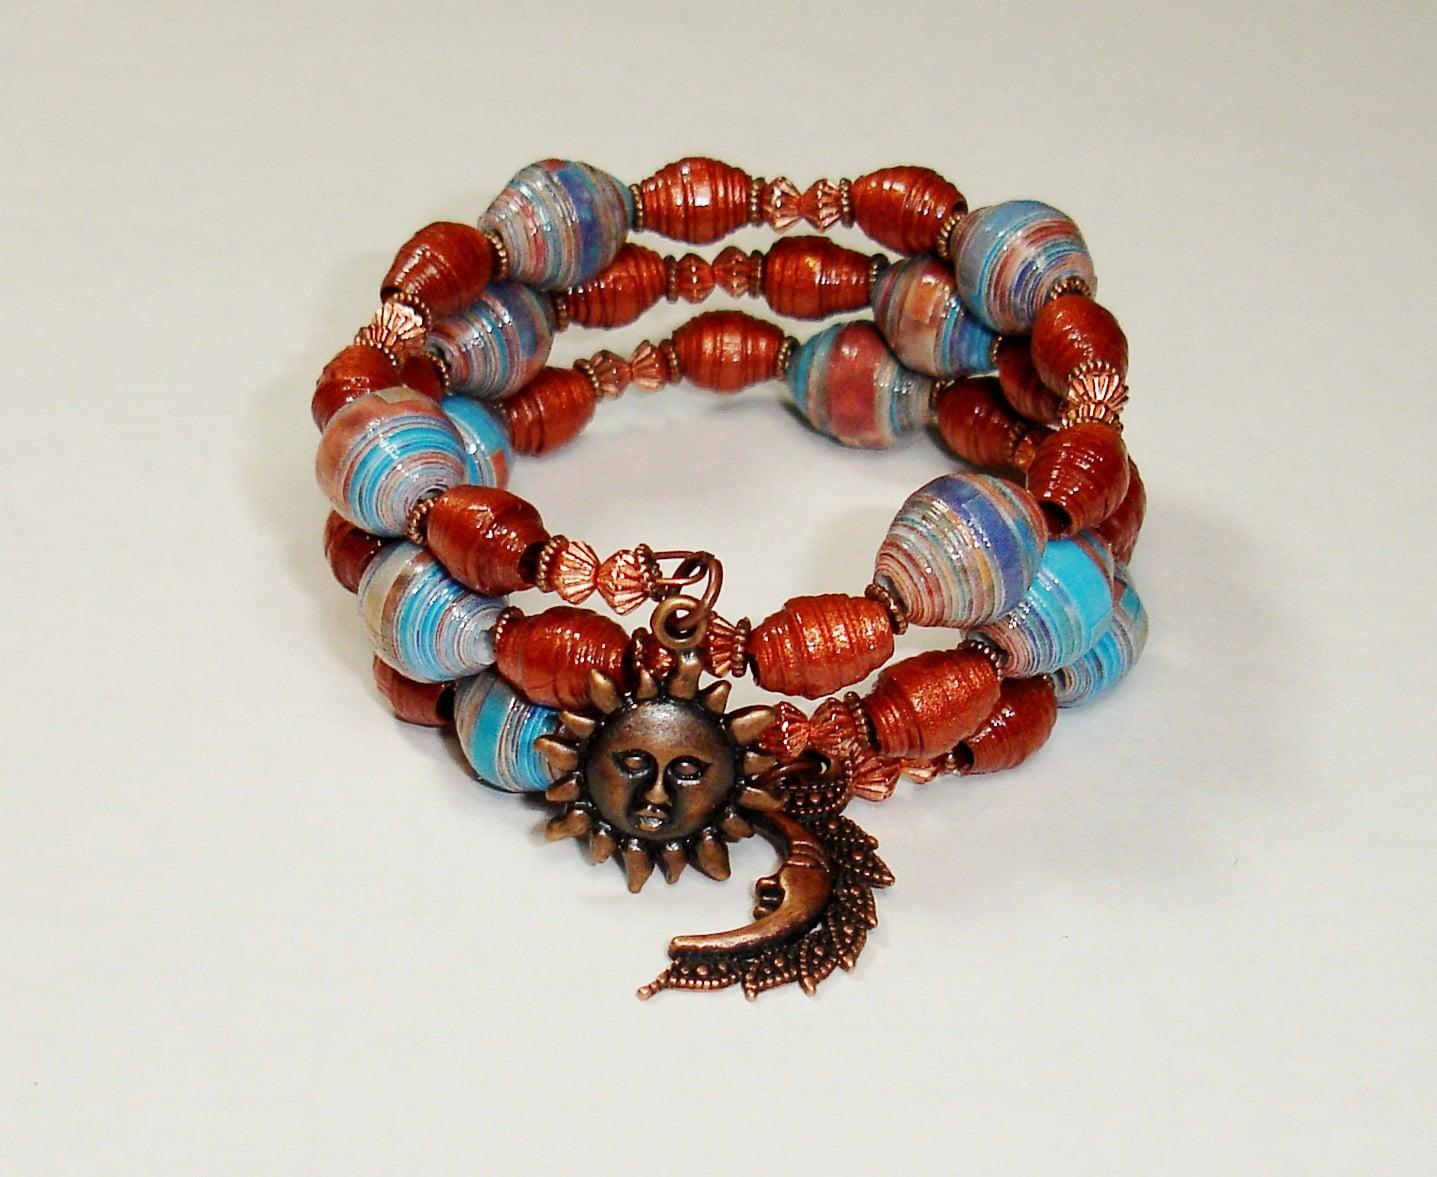 Paper Bead Bracelet Handmade Memory Wire Jewelry Blue | Etsy